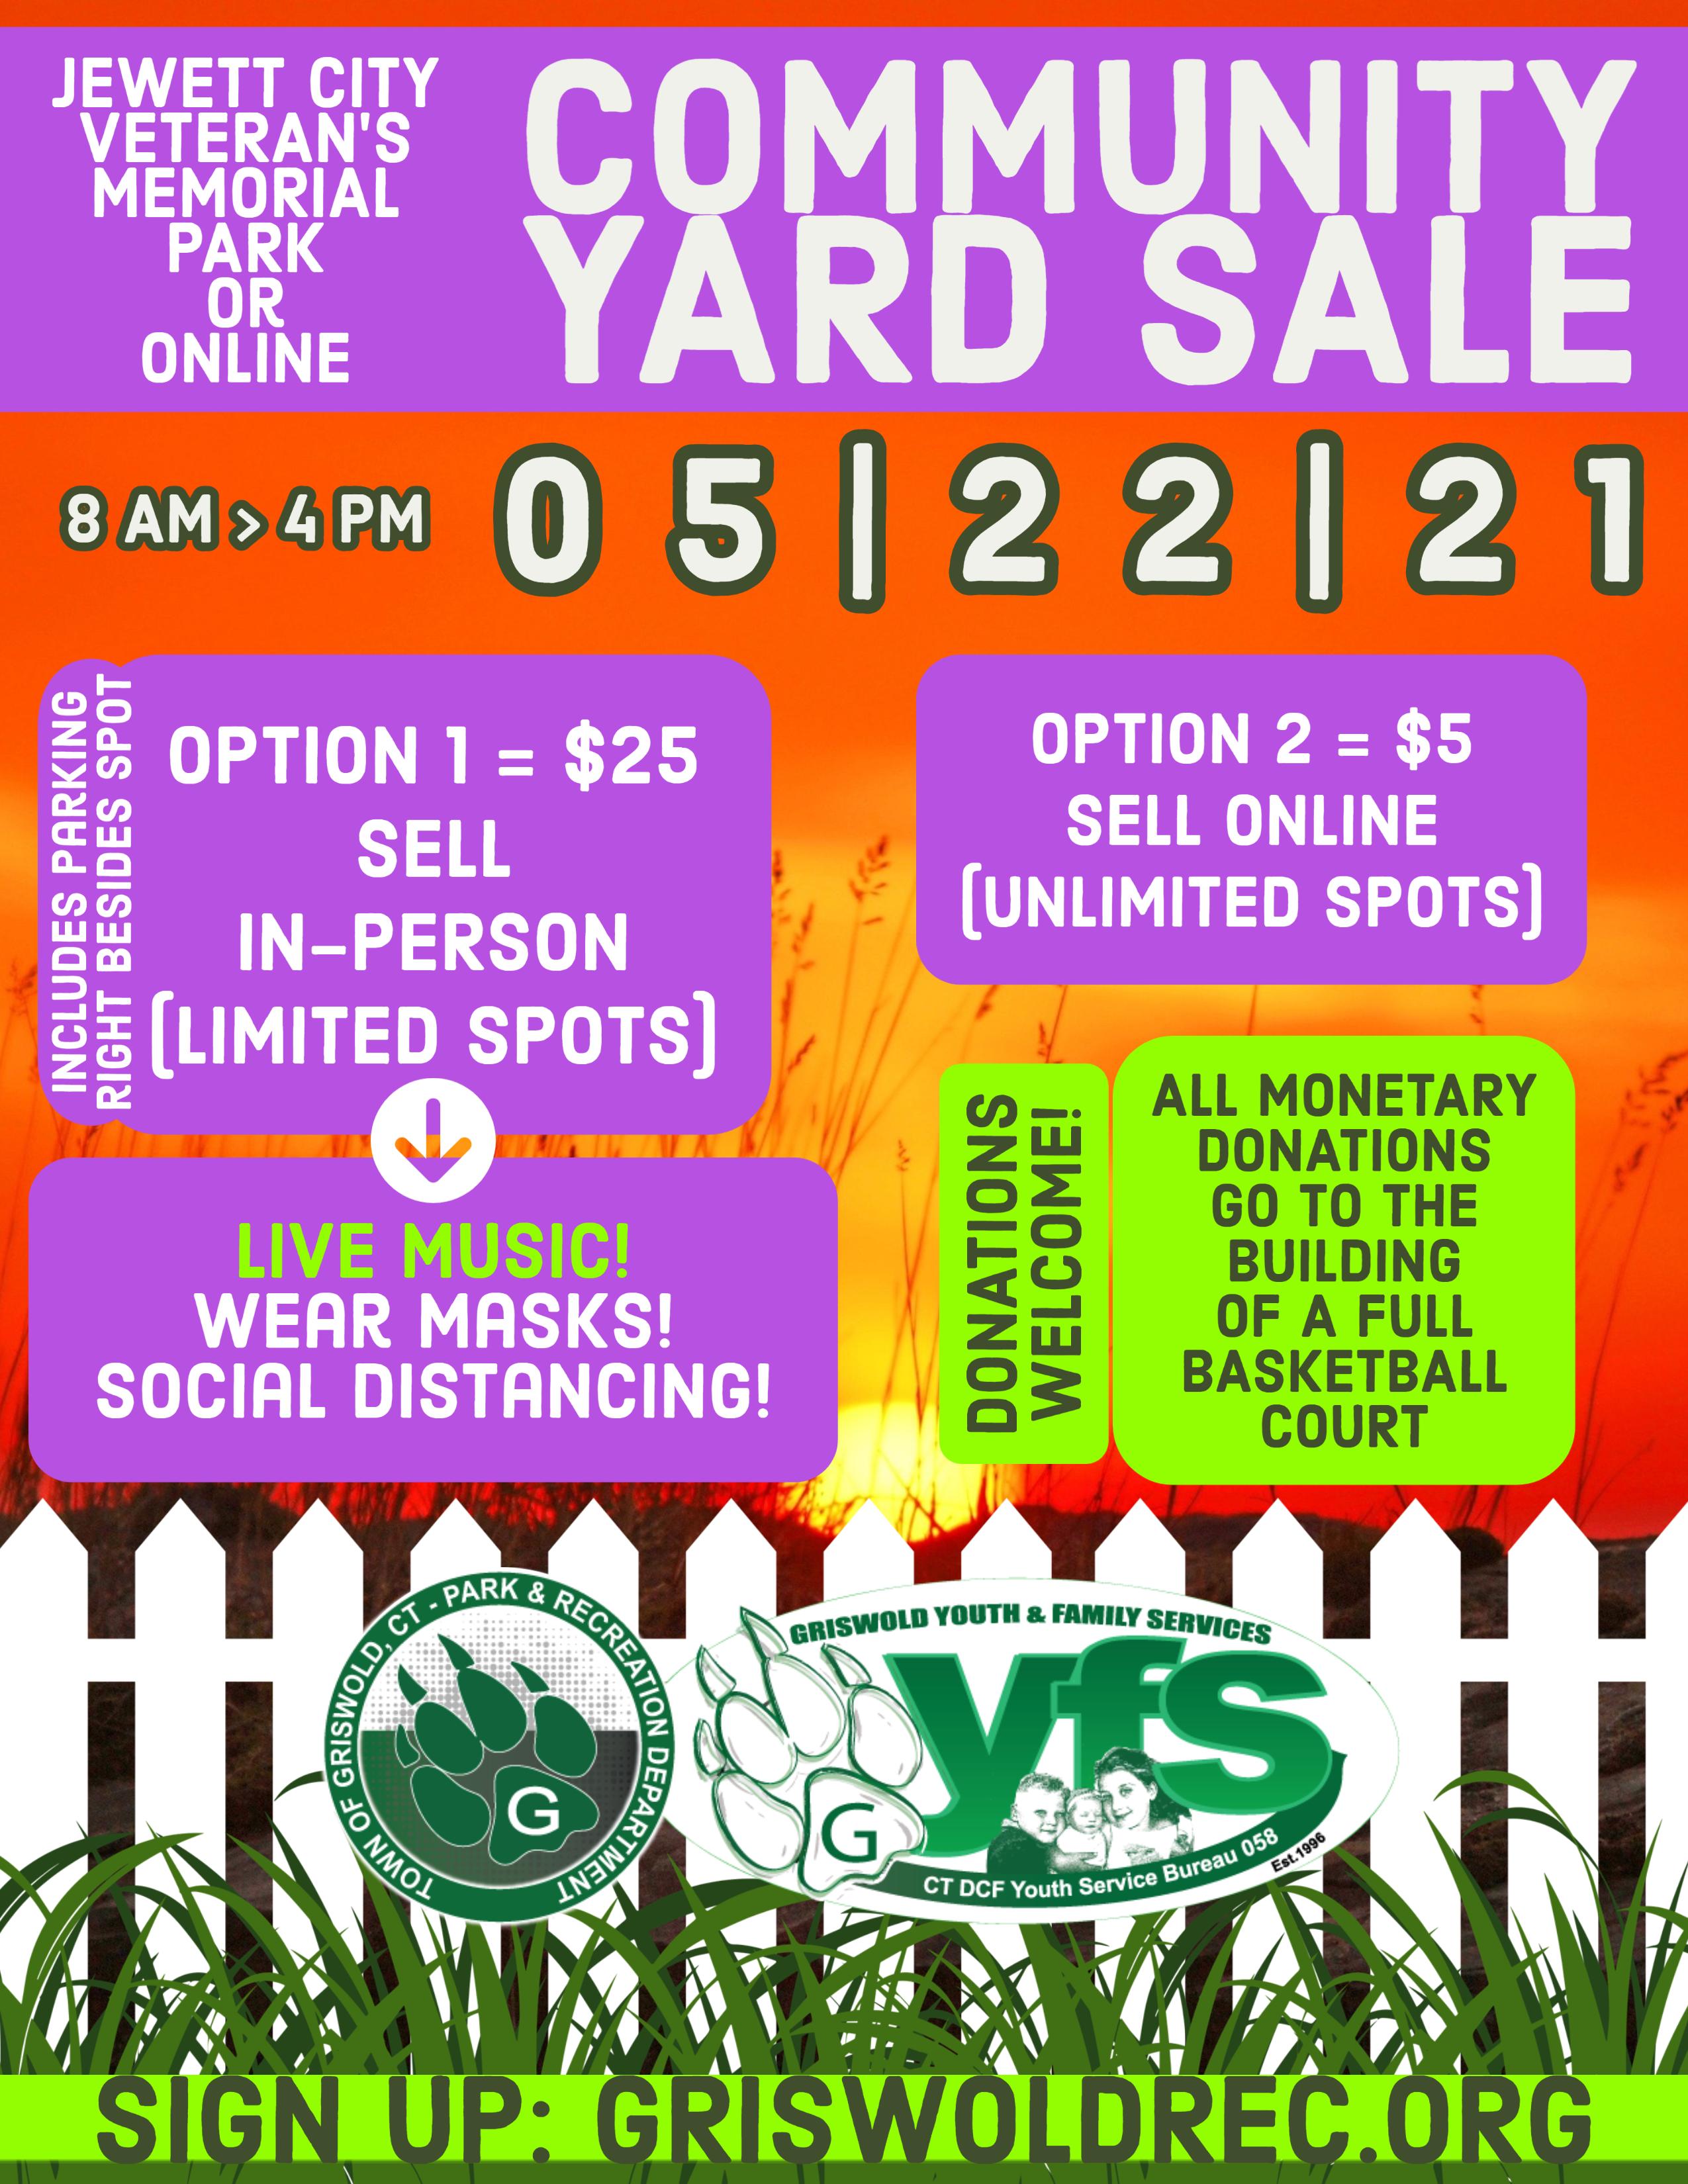 https://0201.nccdn.net/1_2/000/000/169/8c7/community-yard-sale.png